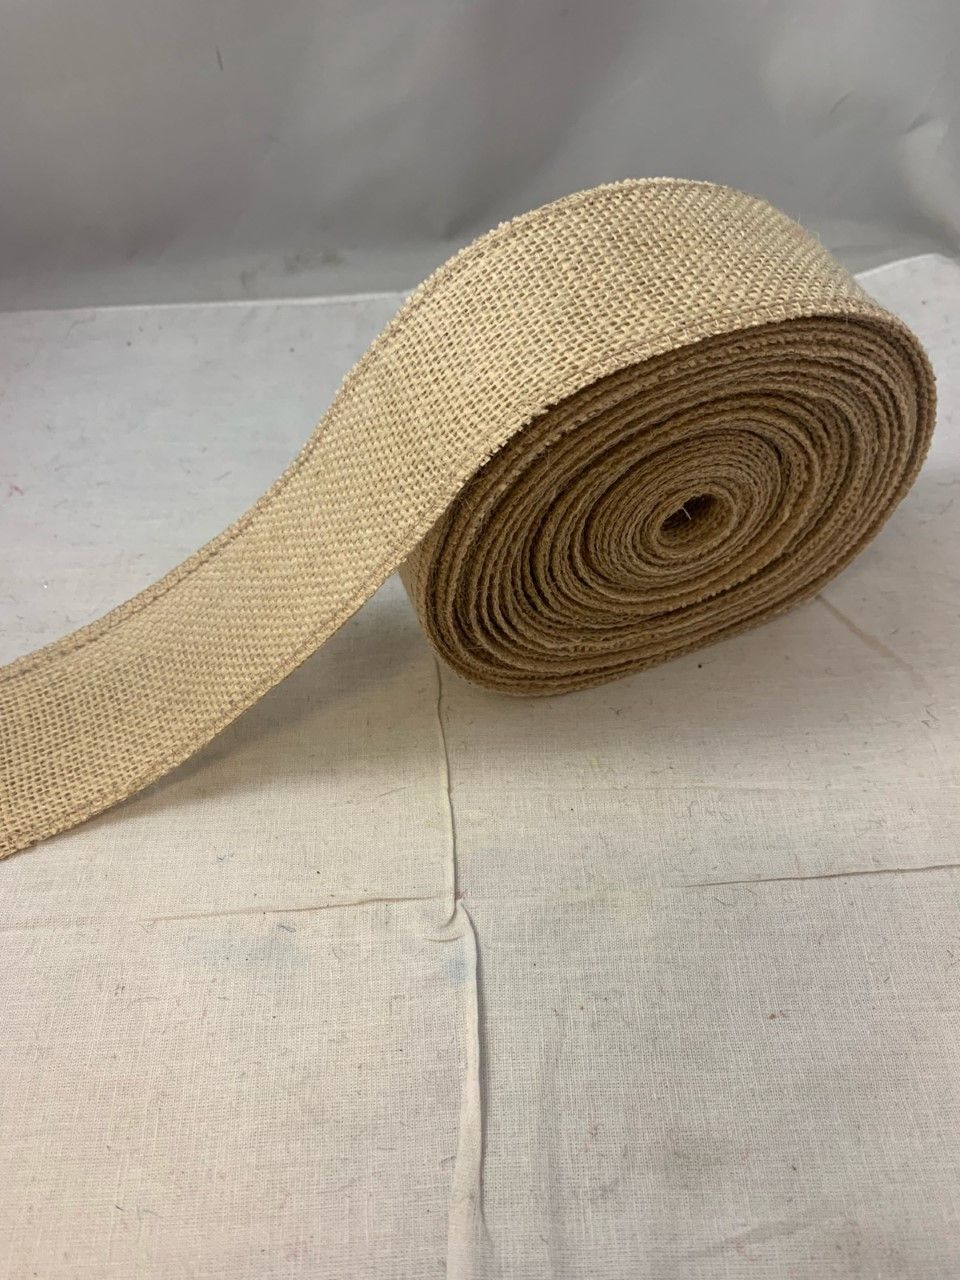 2 Florida Sand Burlap Ribbon 10 Yards Serged Made In Usa In 2020 Burlap Ribbon Burlap How To Make